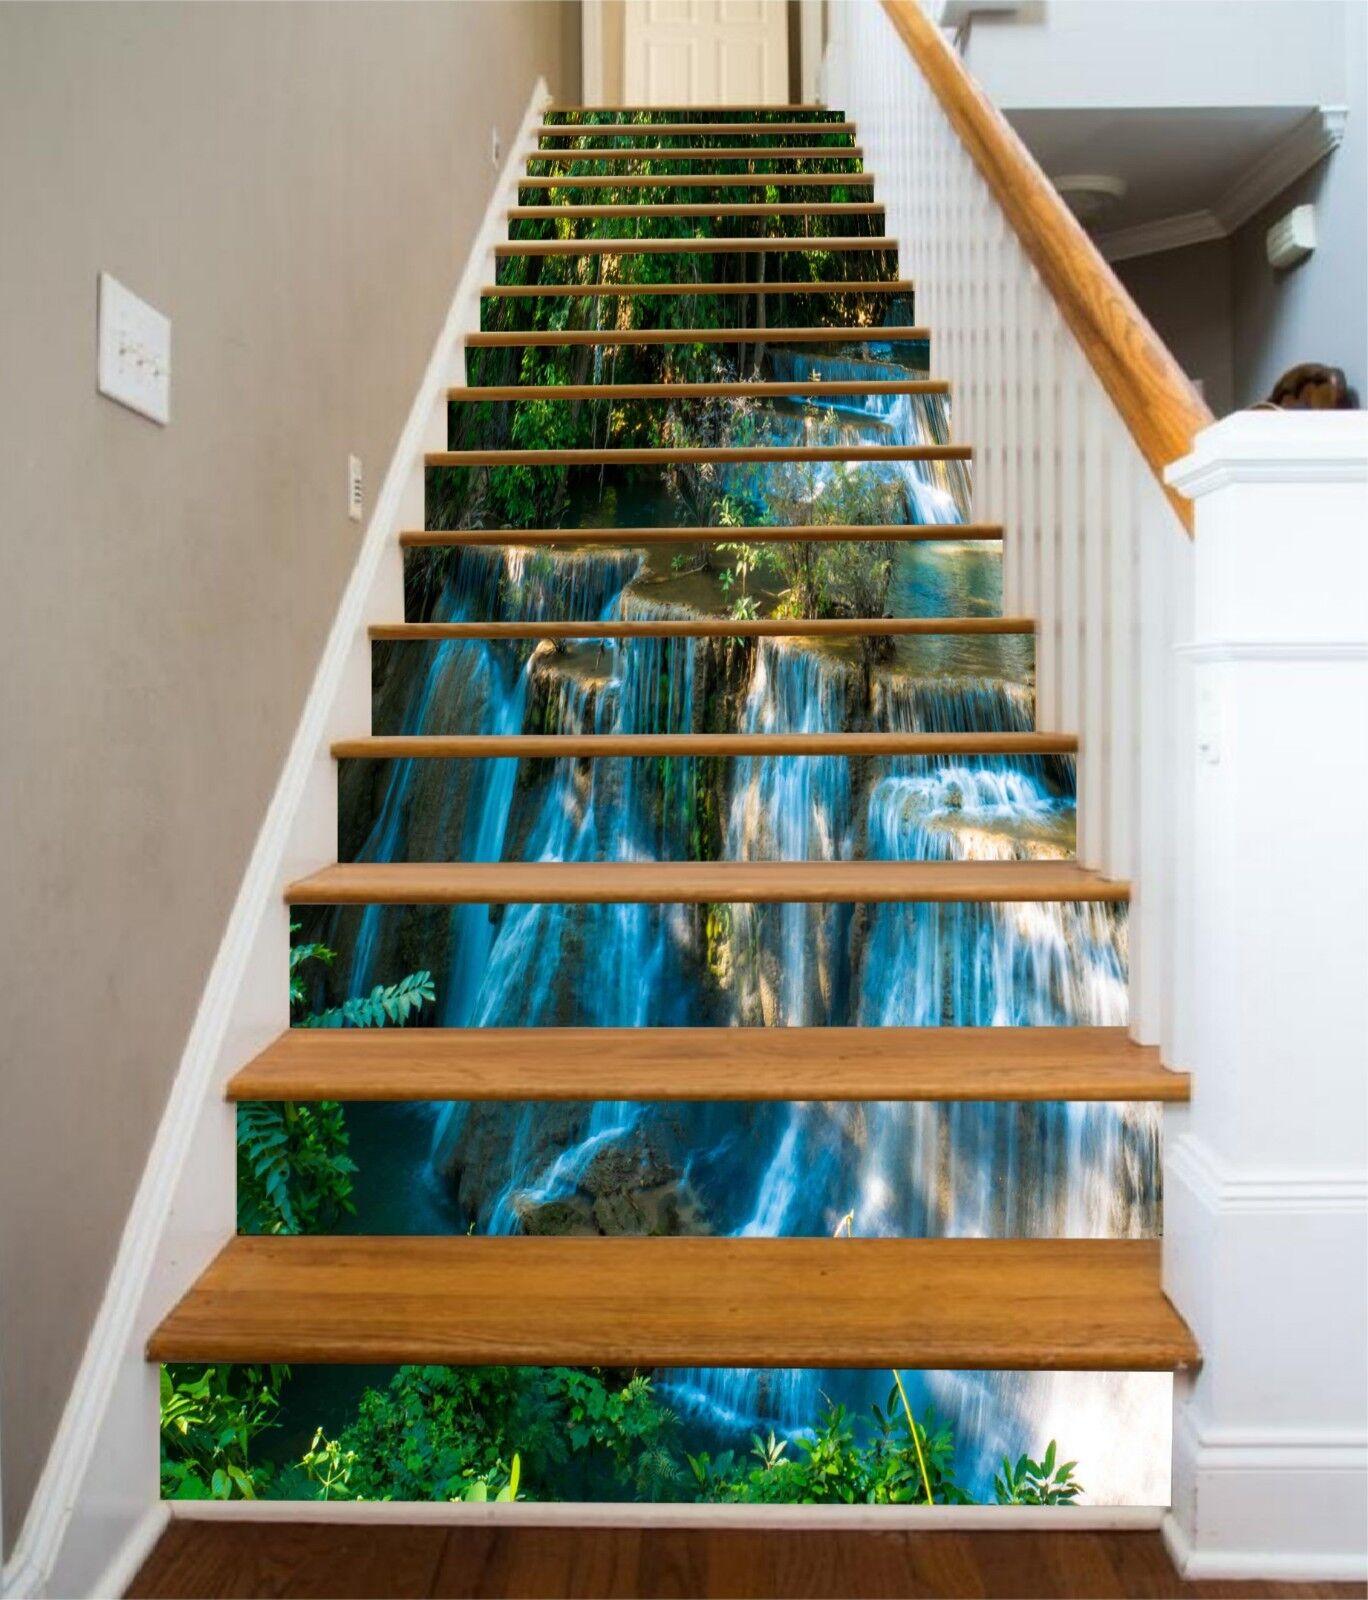 3D Wasserfall 2134 Stair Risers Dekoration Fototapete Vinyl Aufkleber Tapete DE